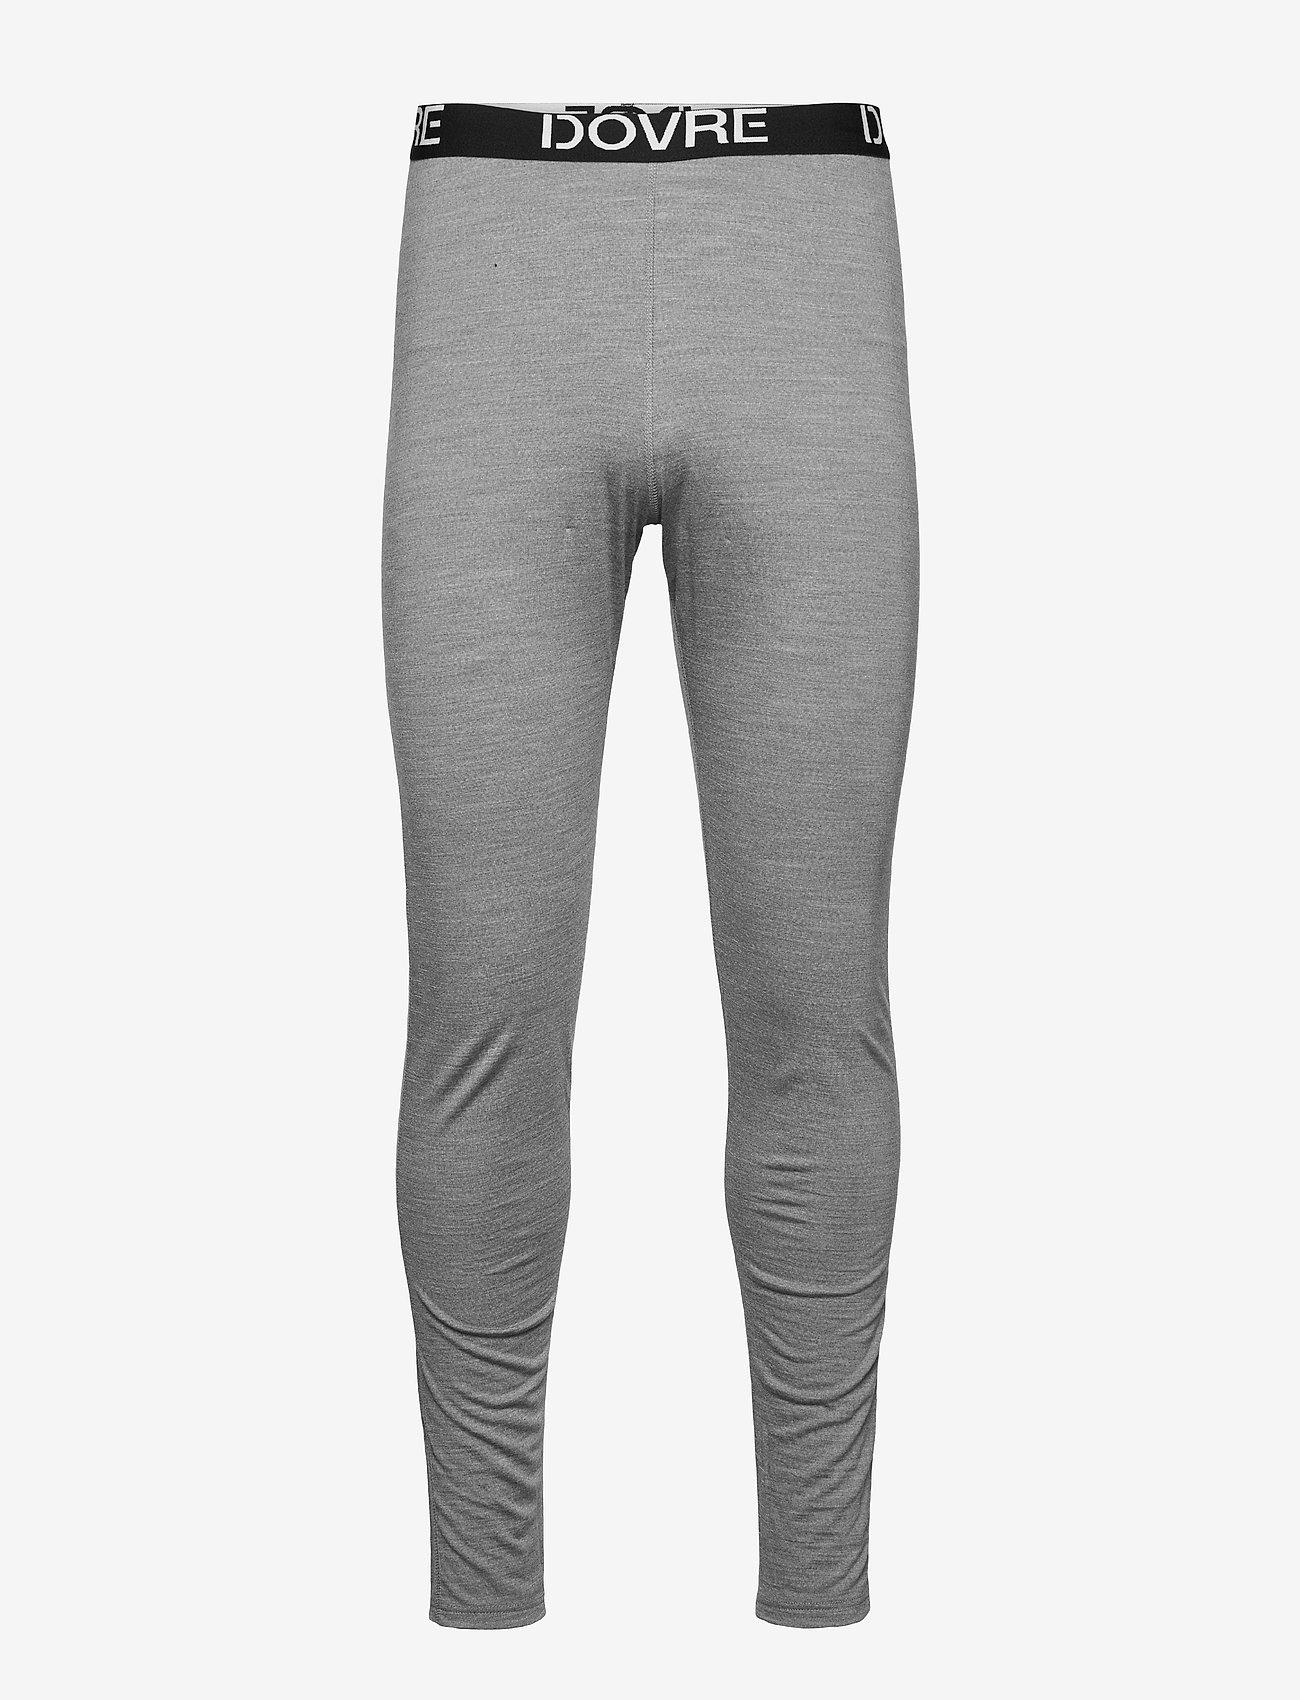 Dovre - Longlegs 100% wool - base layer bottoms - ljusgrå me - 0